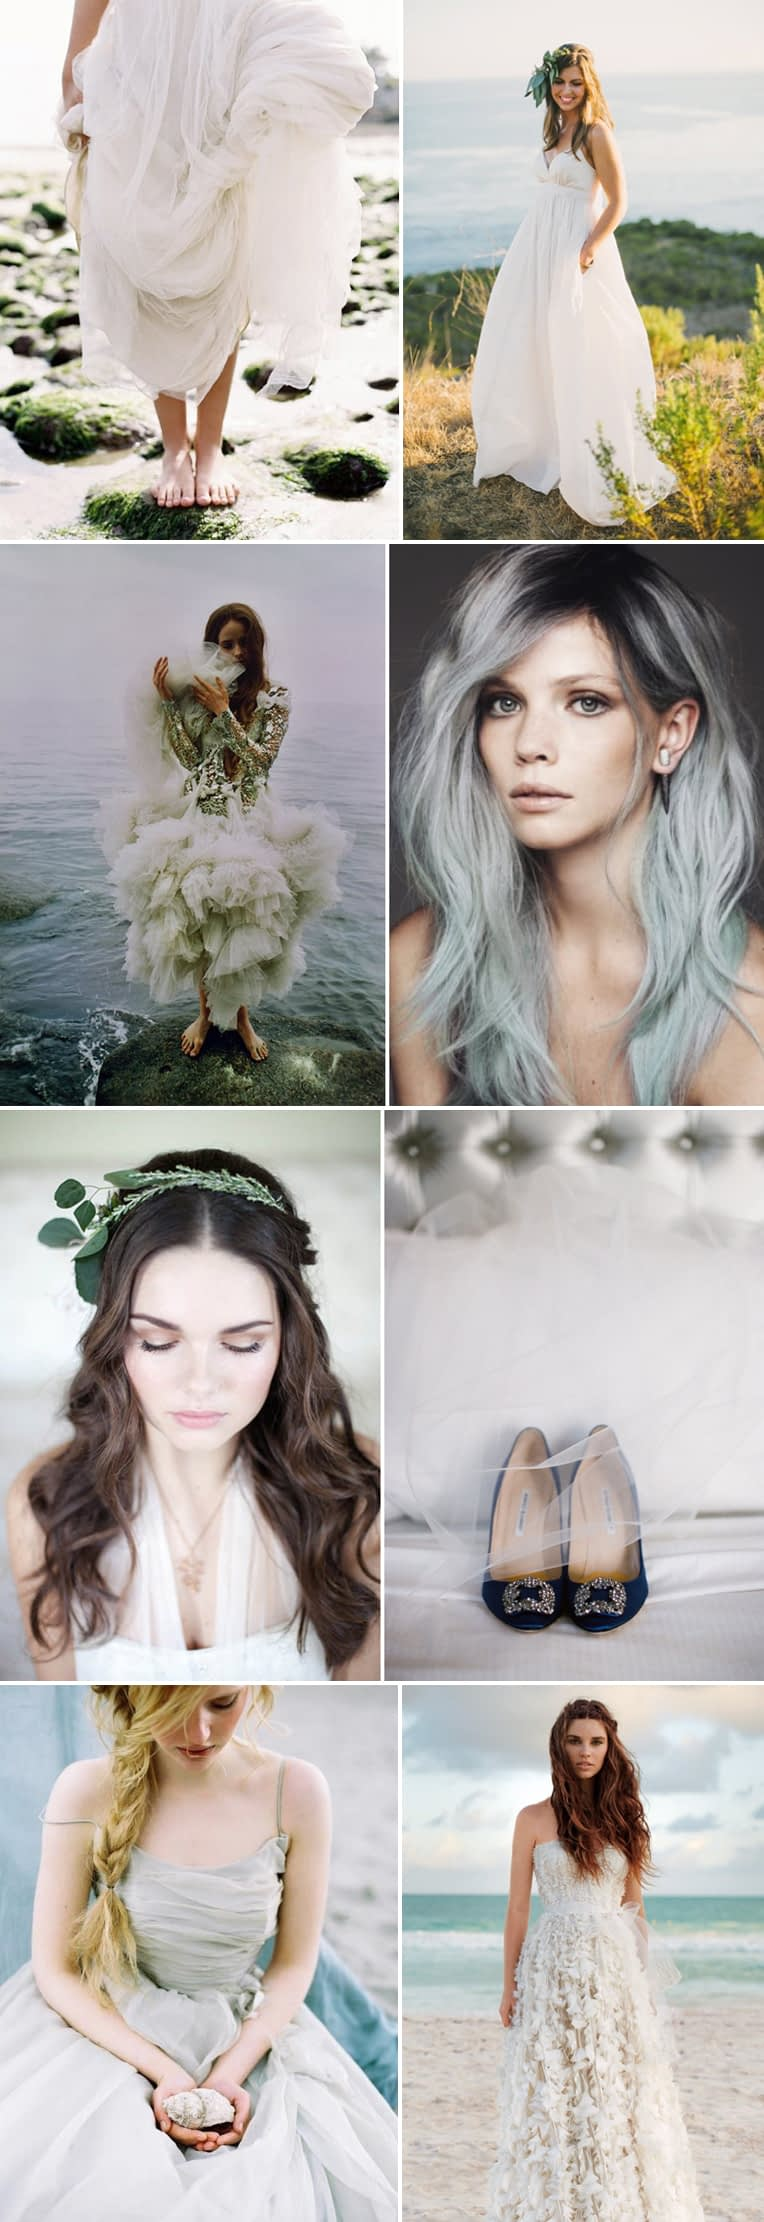 Coco Wedding Venues - Style Categories - Coastal Cool - Siren.